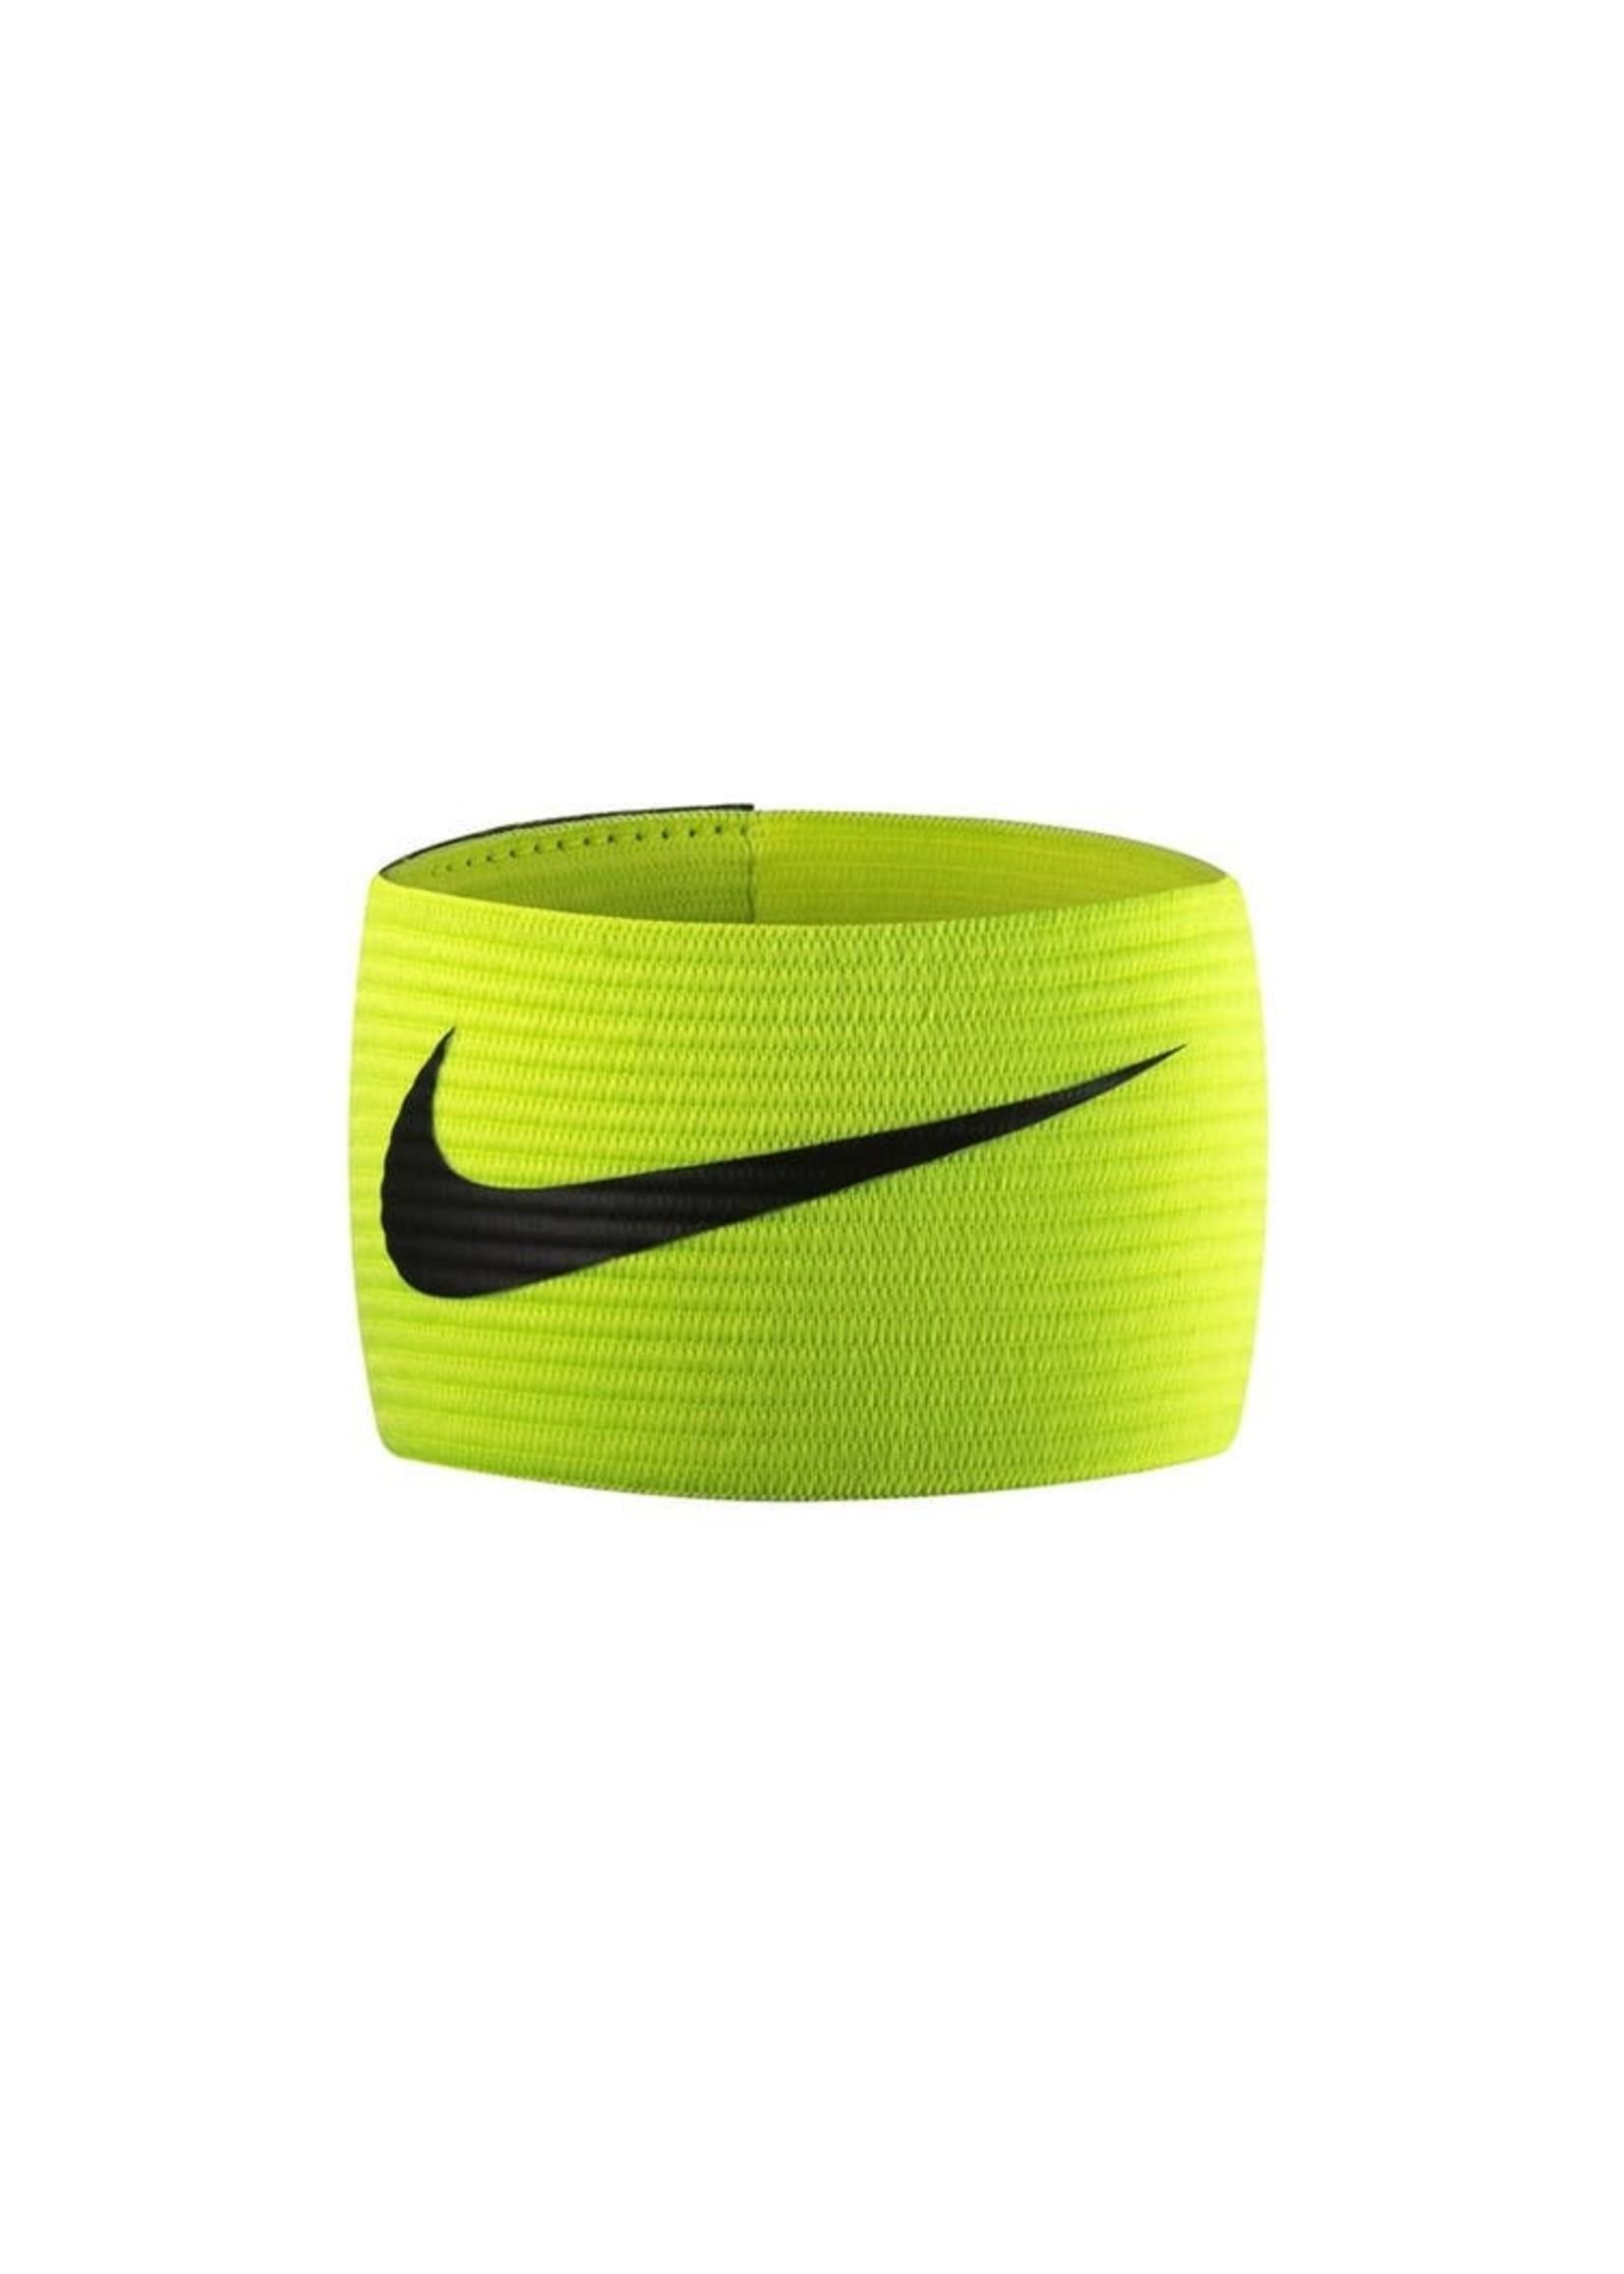 Nike Futbol Arm Band 2.0 - Neon Yellow